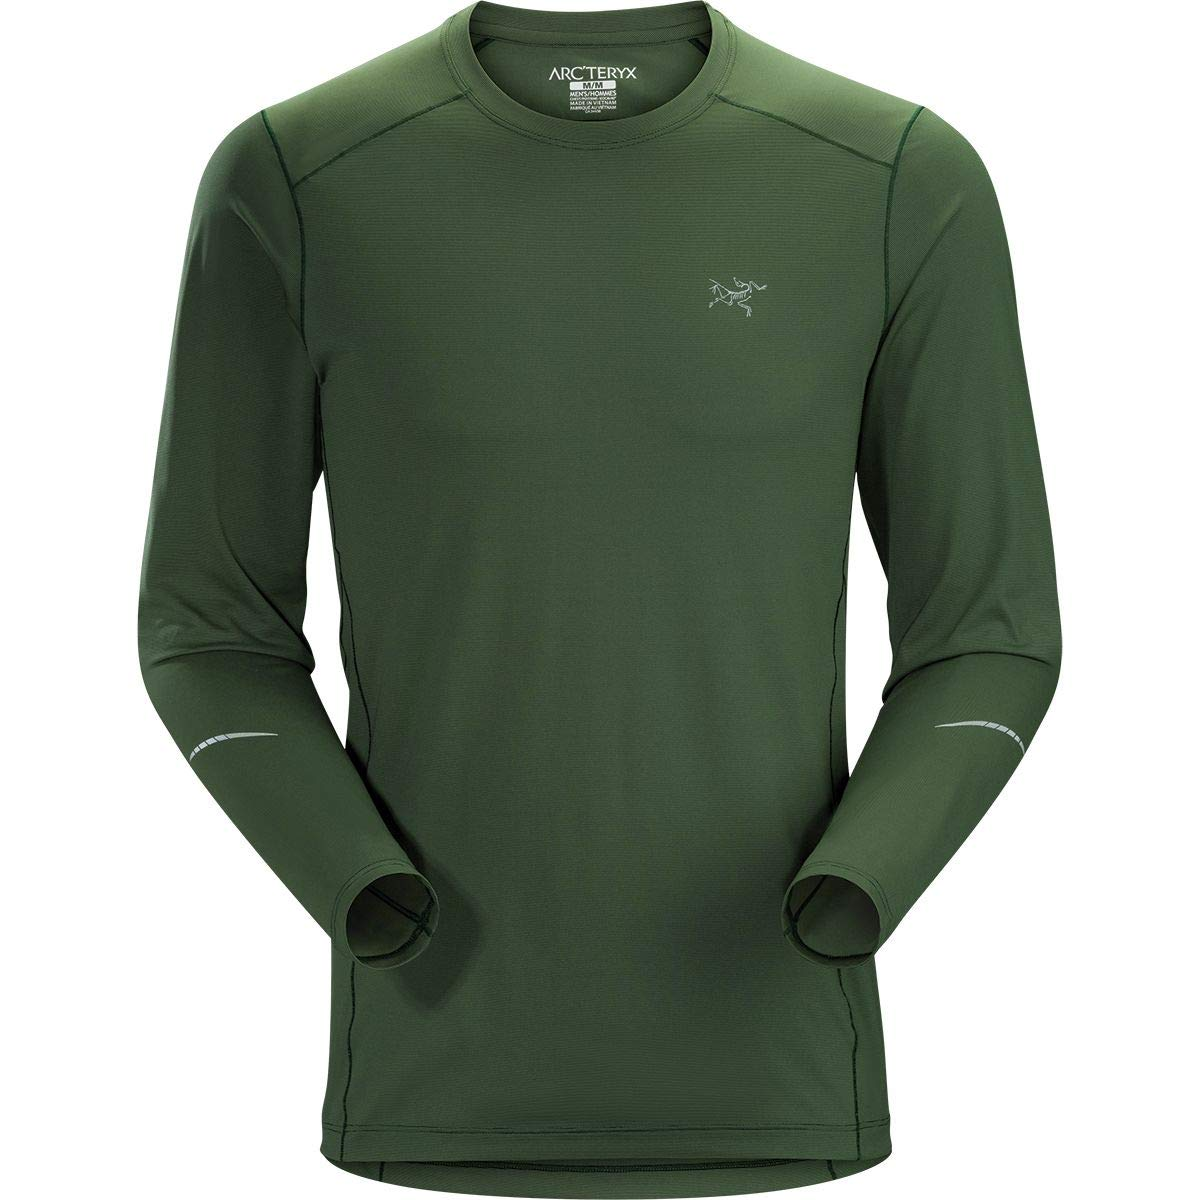 1620576d6 Amazon.com: Arcteryx Motus LS Crew - Men's: Clothing